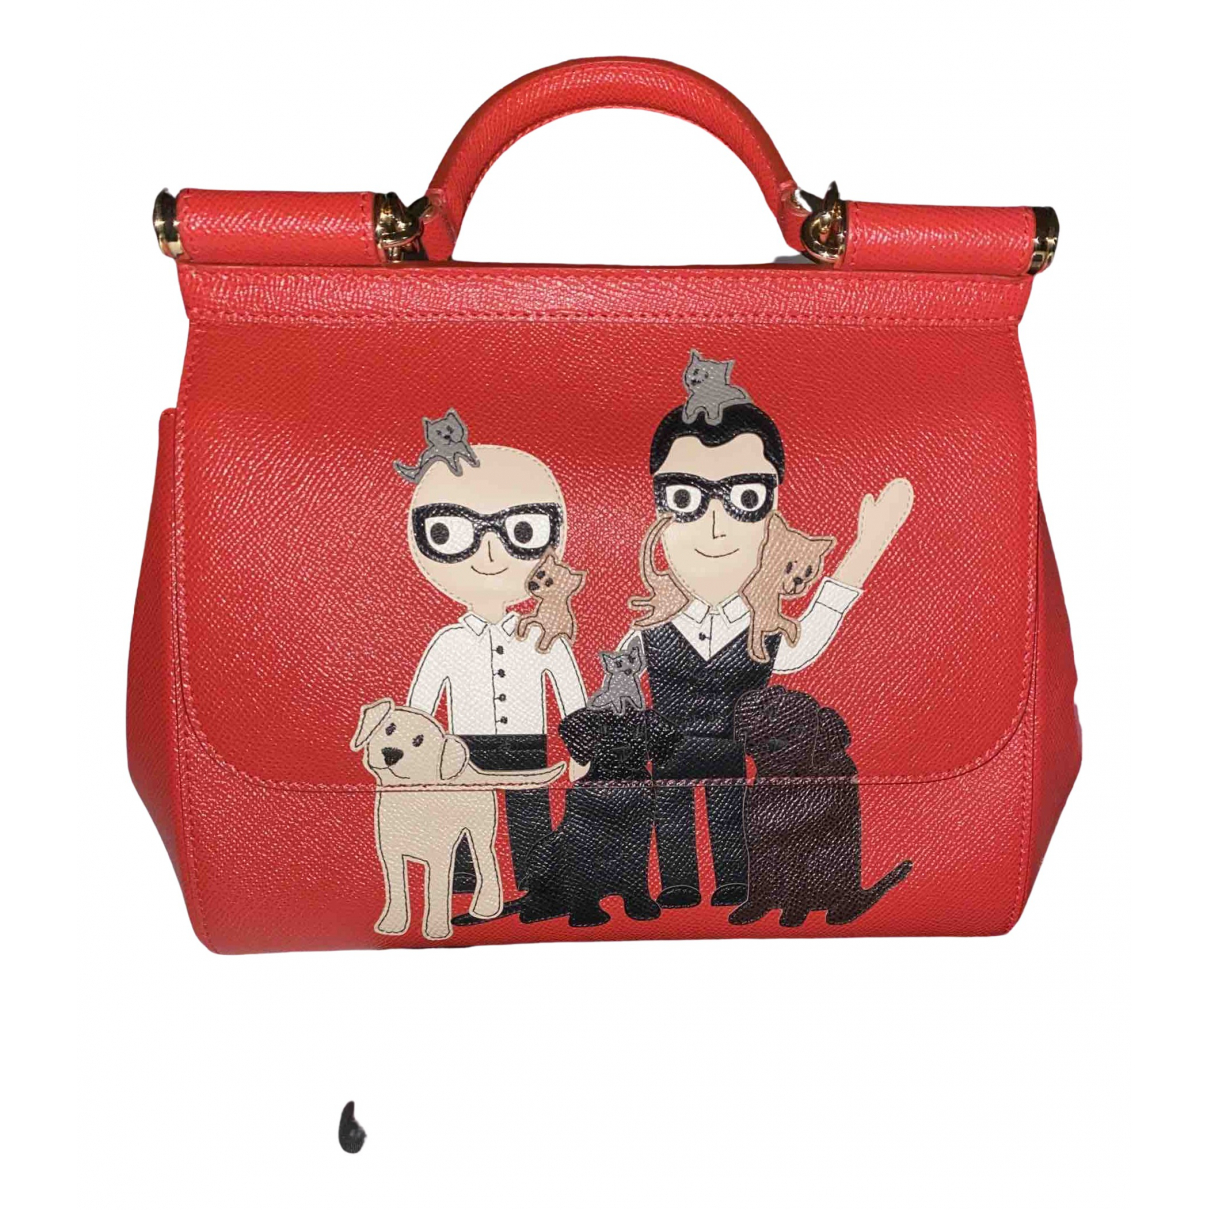 Dolce & Gabbana Sicily Red Leather handbag for Women \N